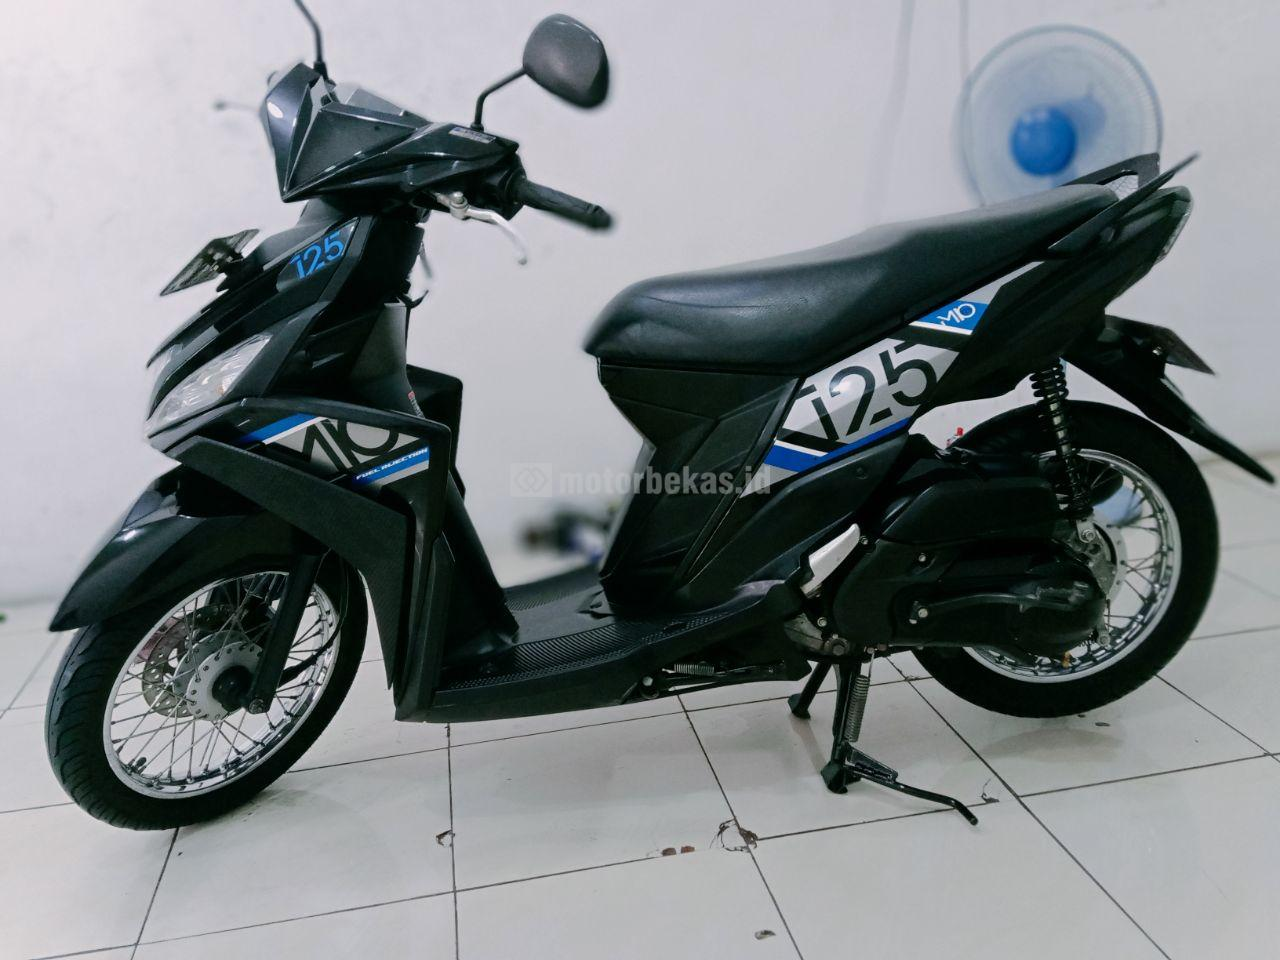 YAMAHA MIO M3 125 FI 2652 motorbekas.id